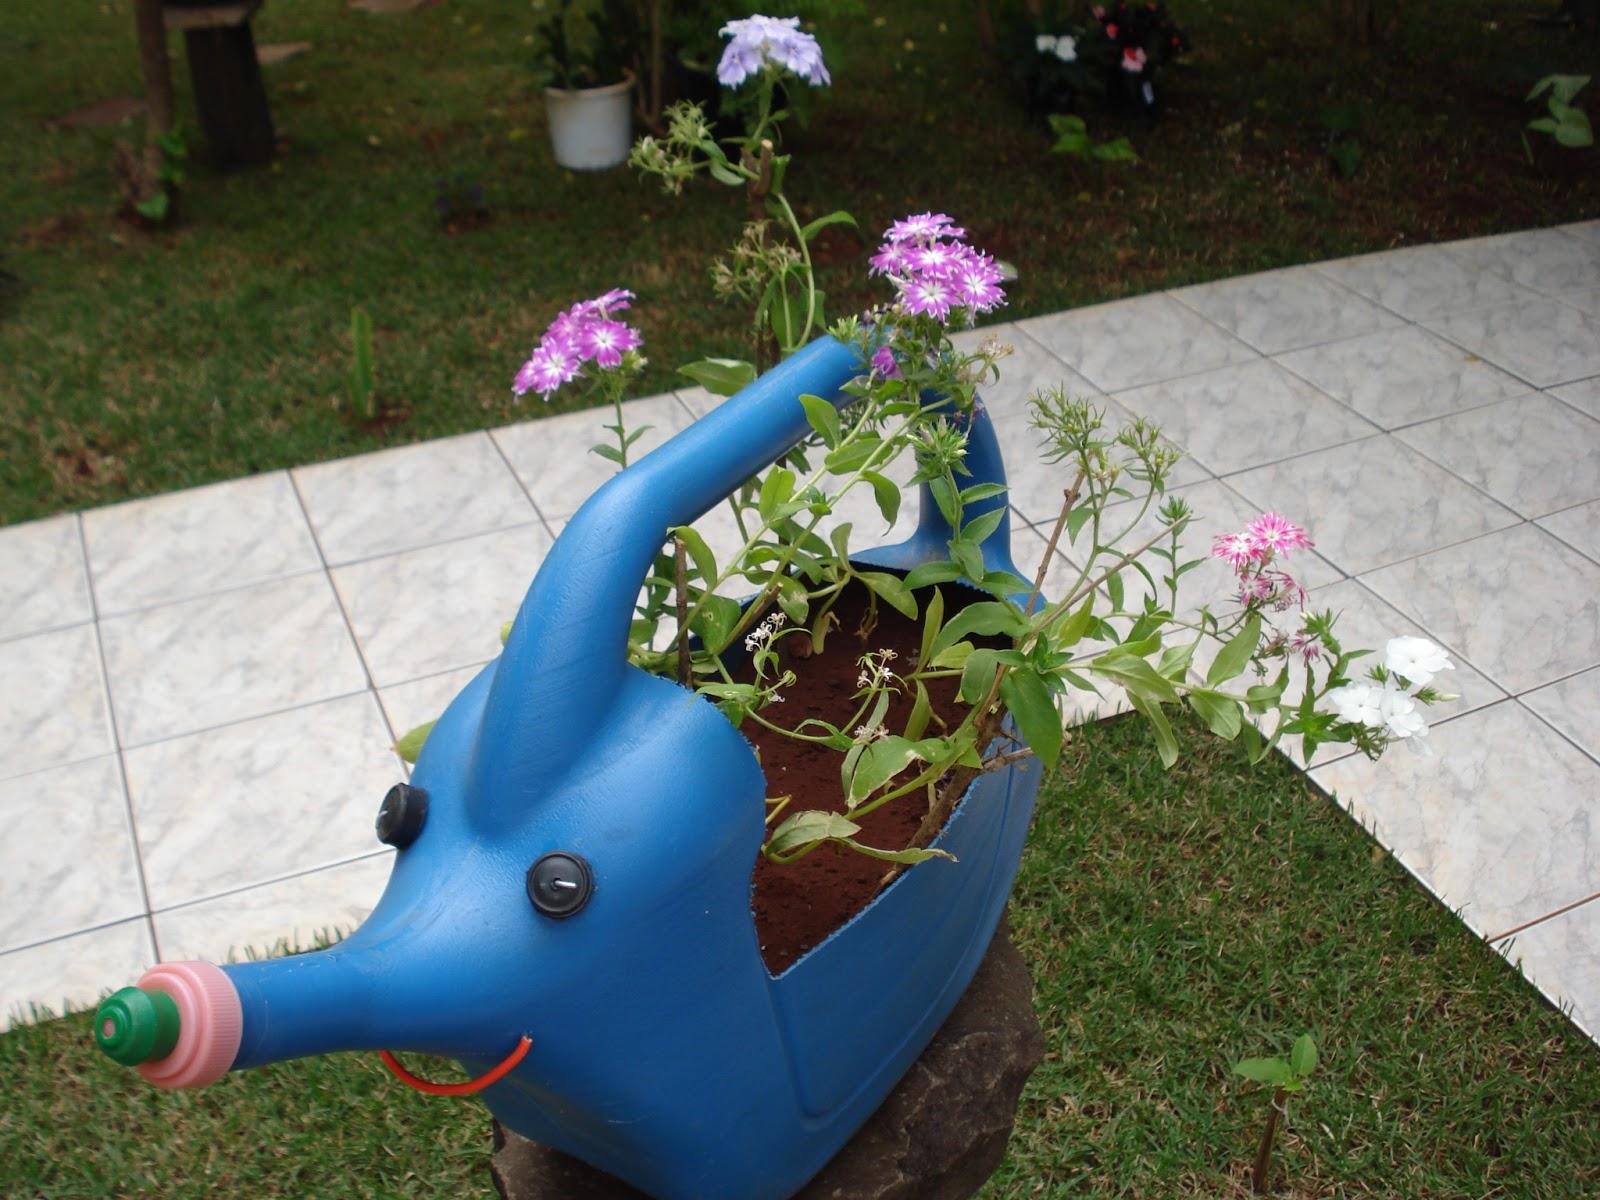 jardins ideias criativas